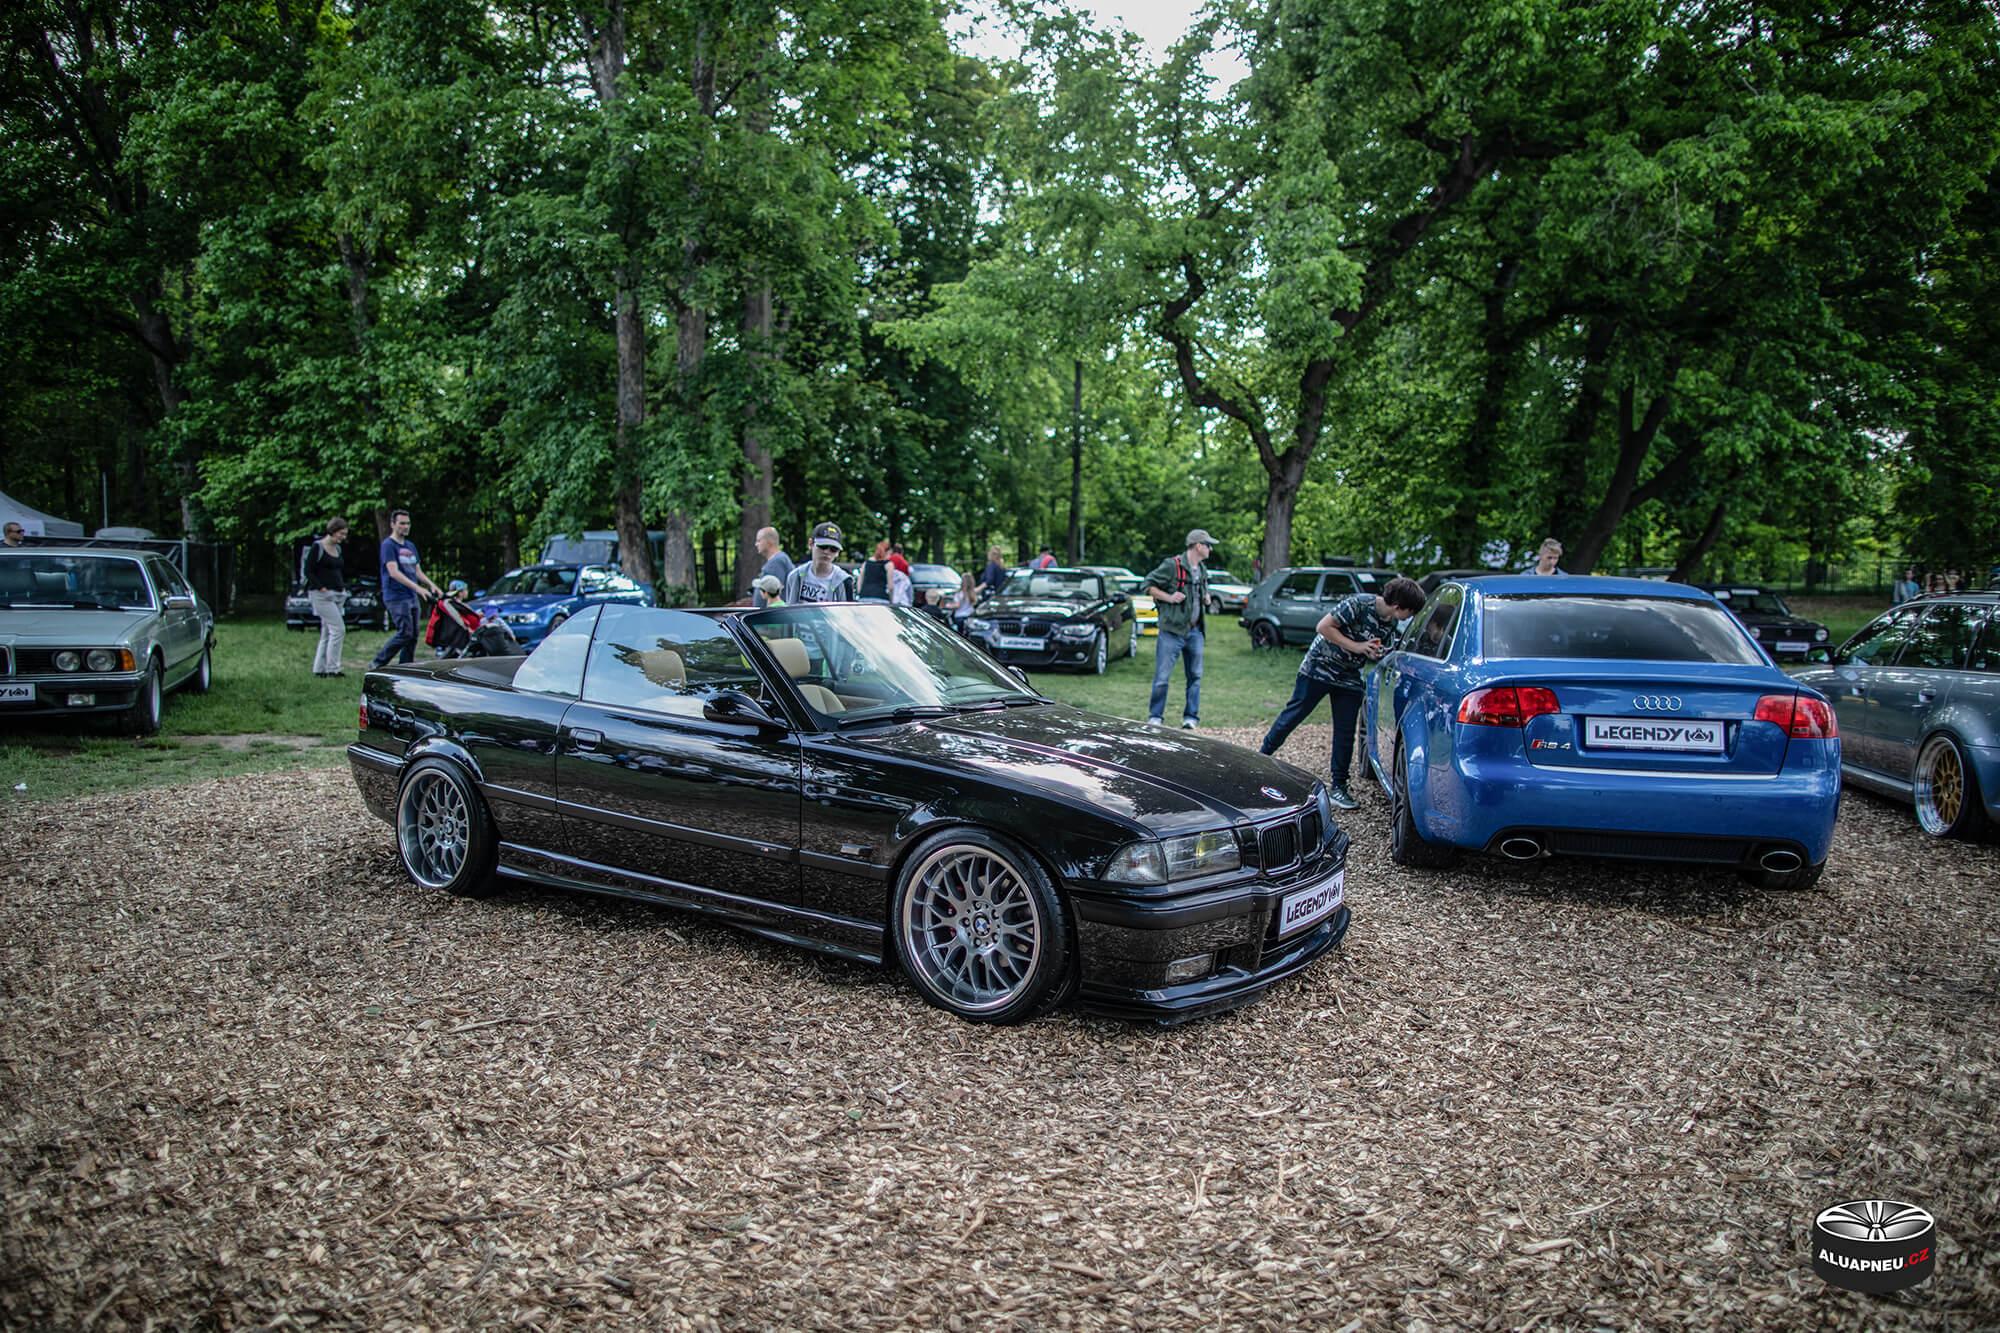 Límcová litá kola Bmw E36 M3 - Automobilové Legendy 2019 - www.aluapneu.cz